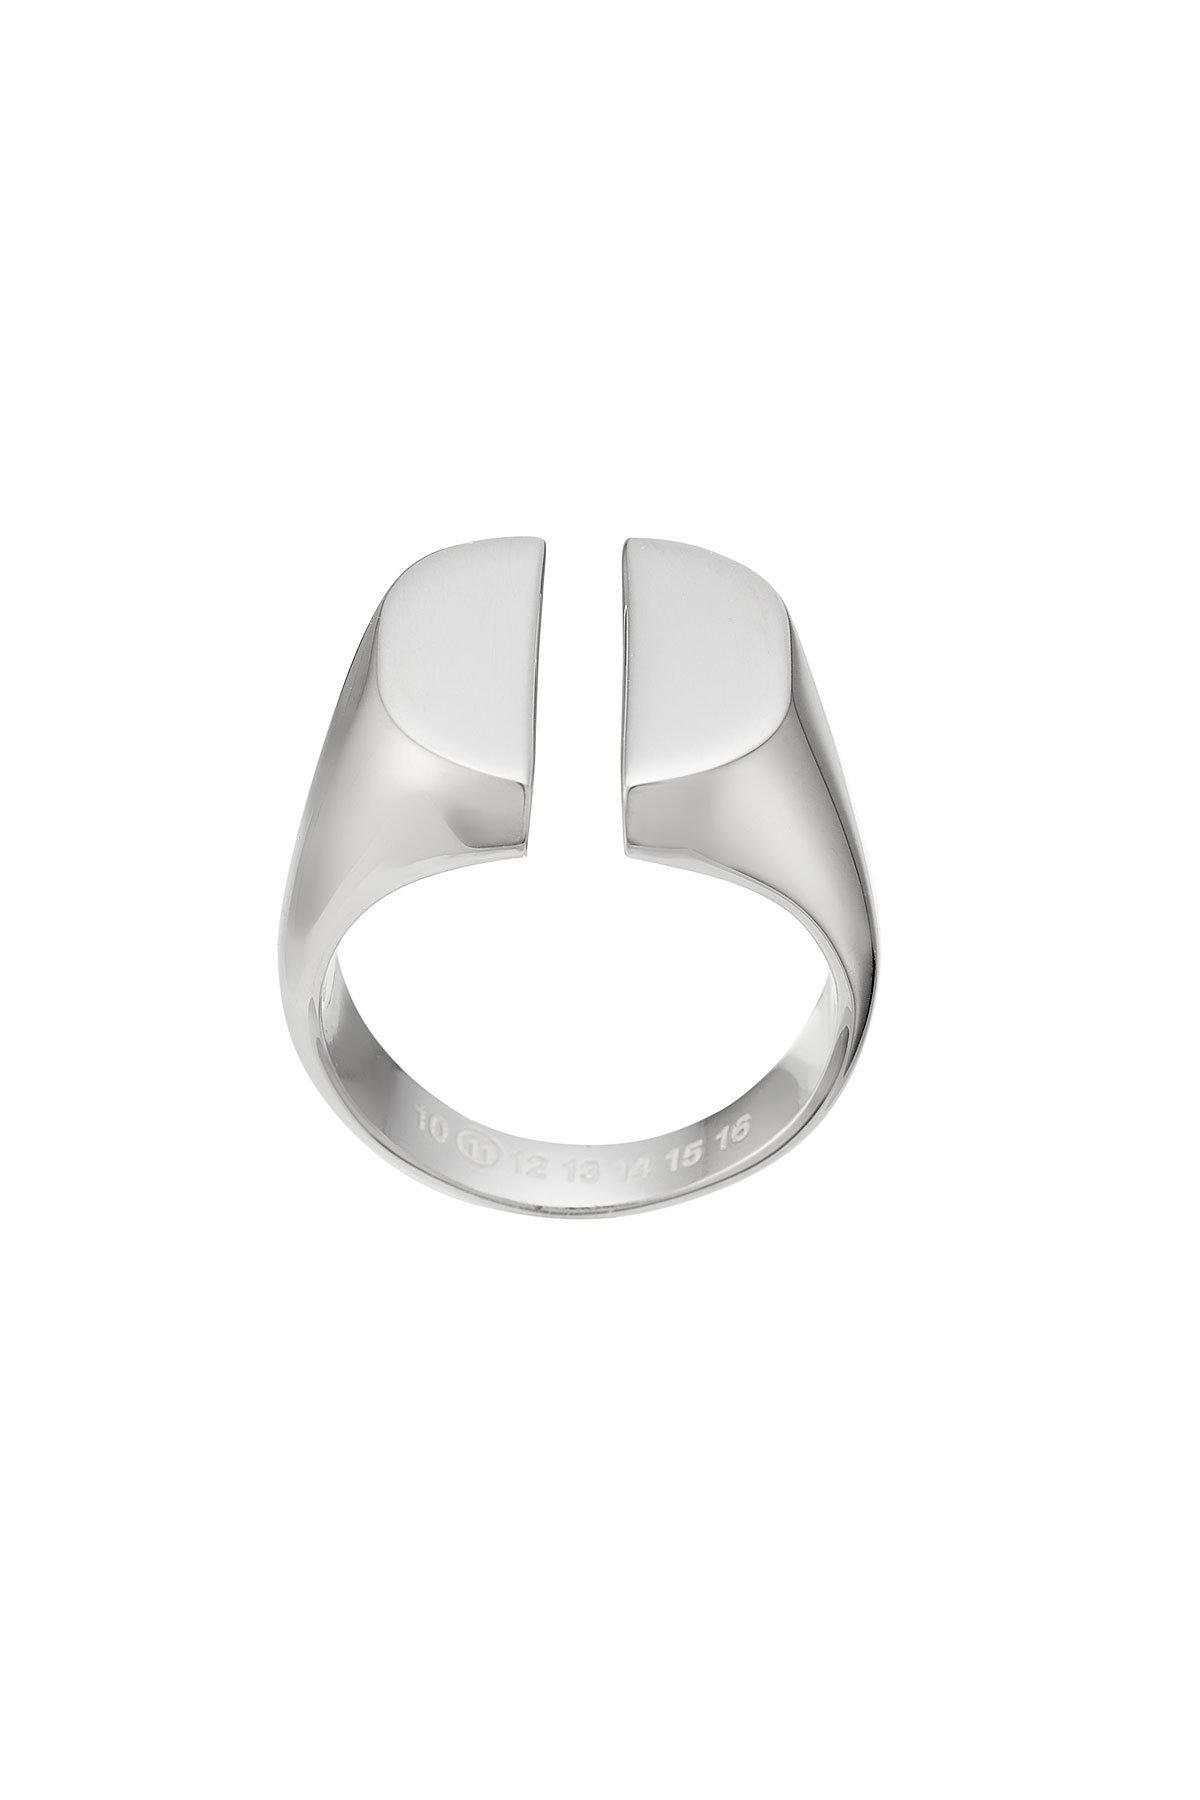 Maison Martin Margiela textured three-band ring - Metallic opxE4rmD